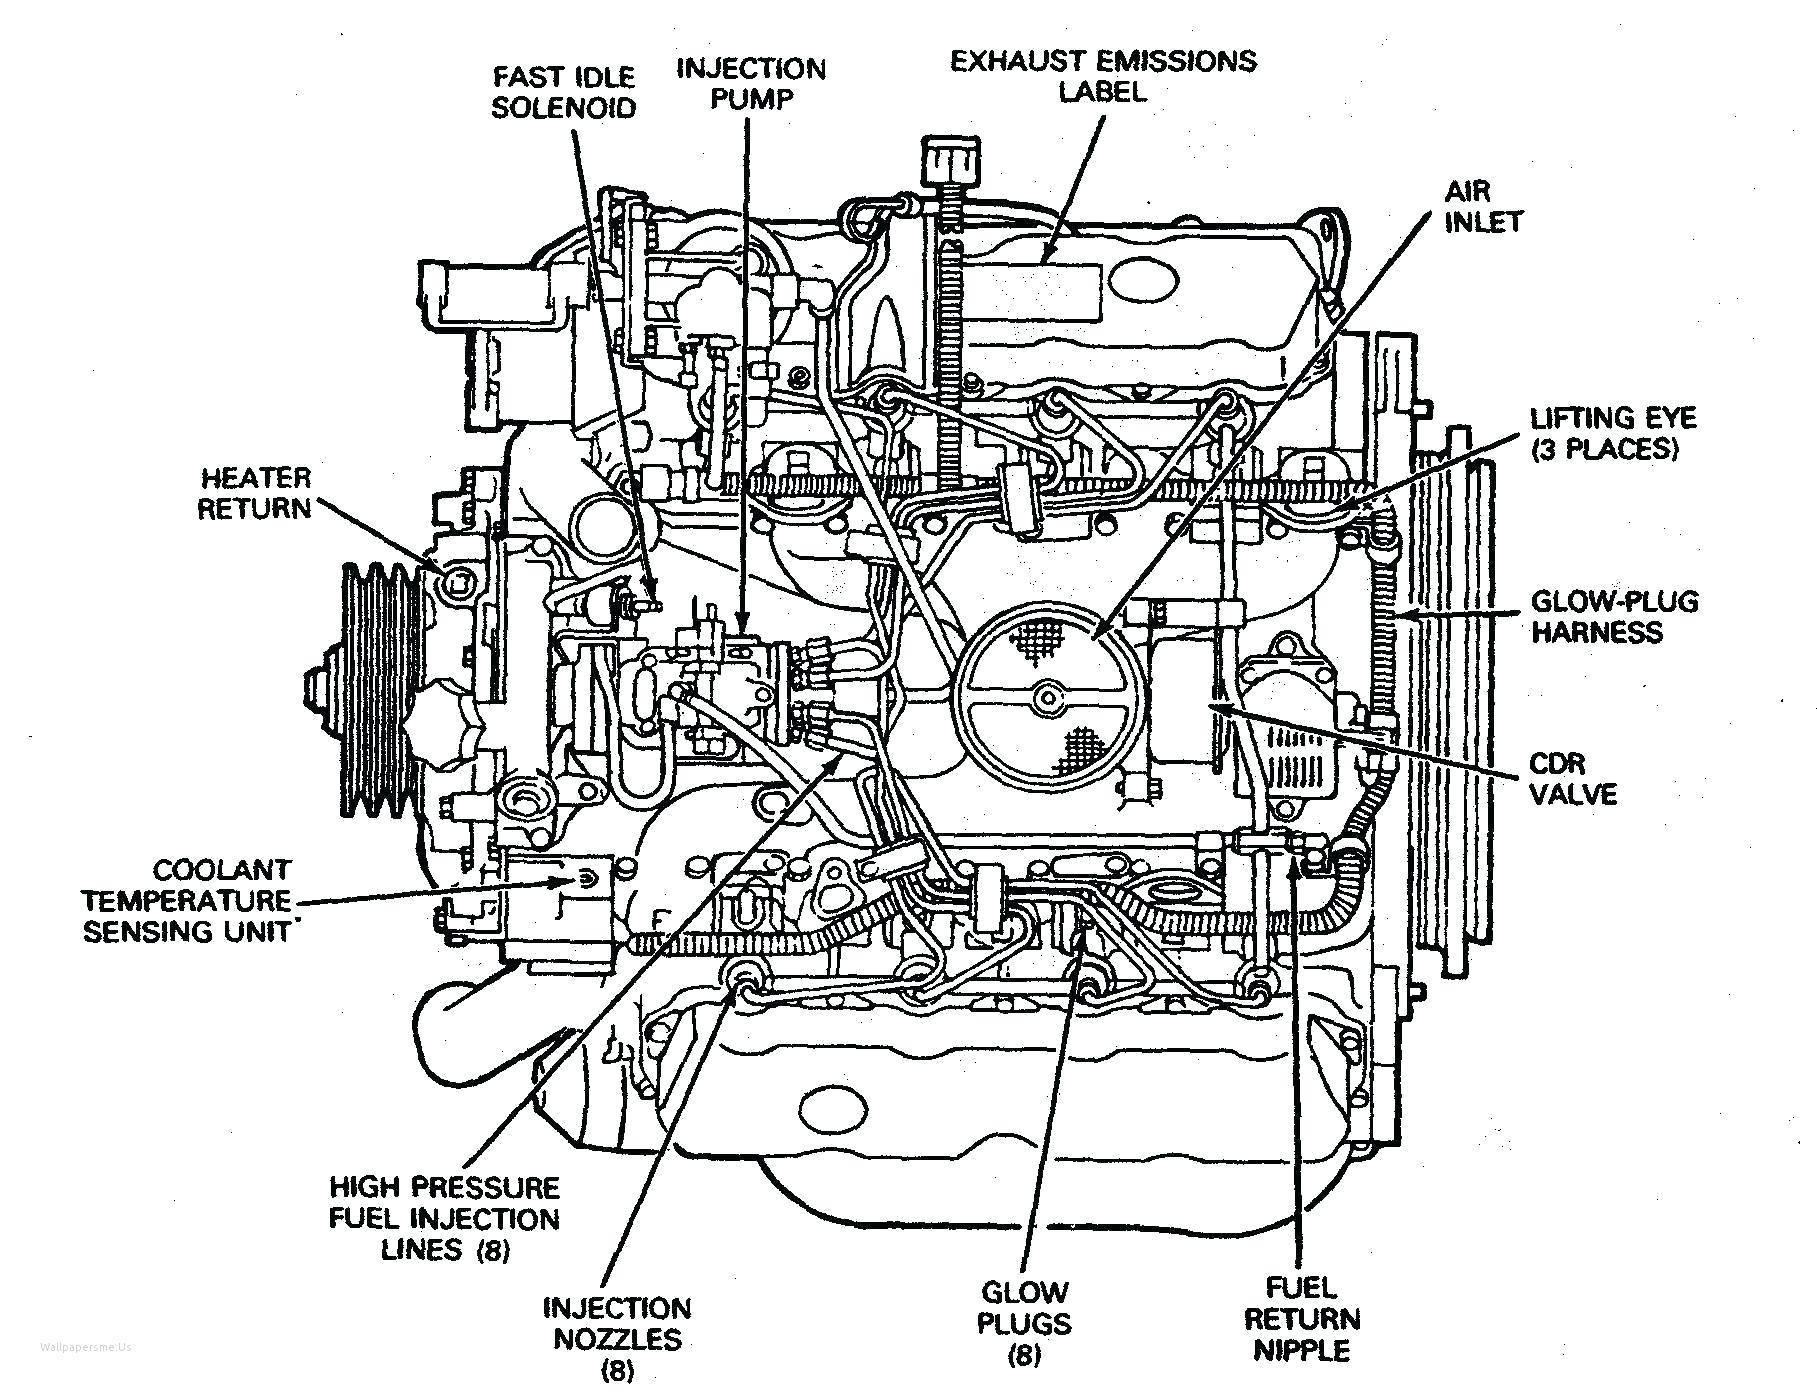 gas engine diagram my wiring diagram rh detoxicrecenze com 4 Cycle Engine Diagram How a 4 Stroke Engine Works